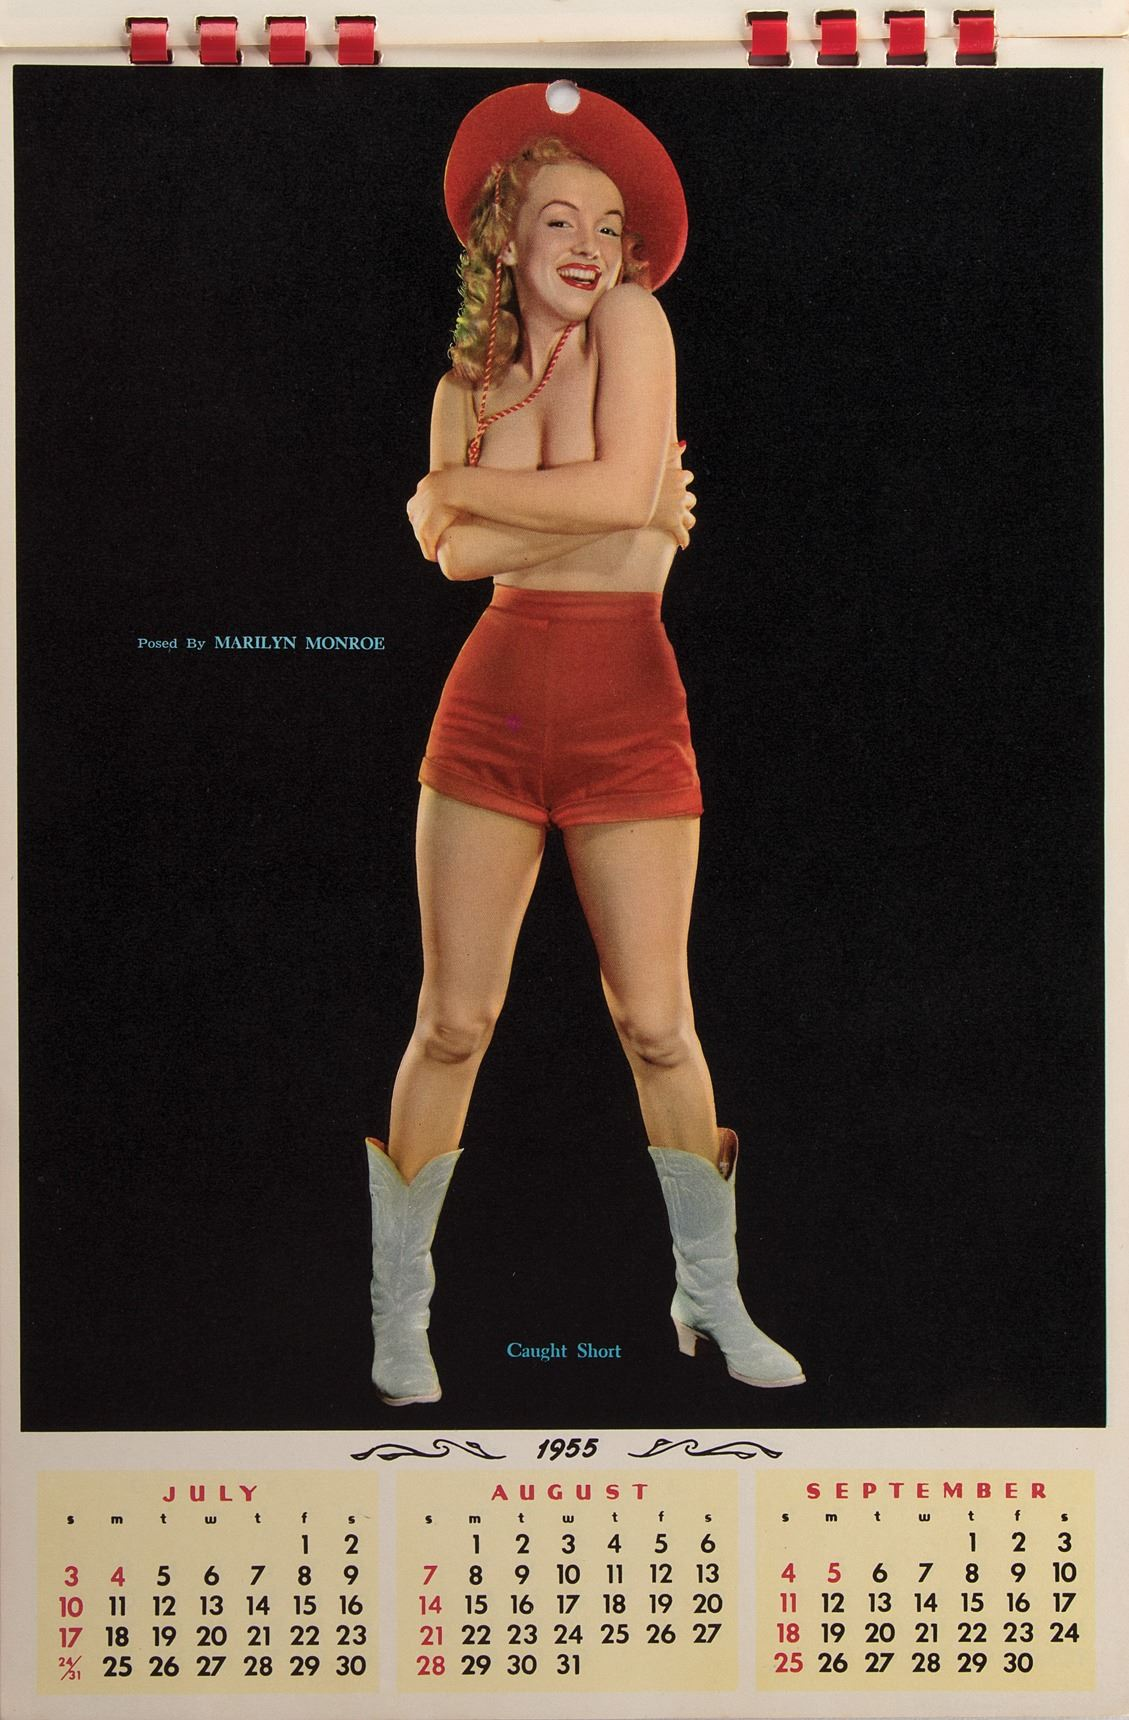 Marilyn Monroe 1955 Pin Up Cowgirl Calendar Sample